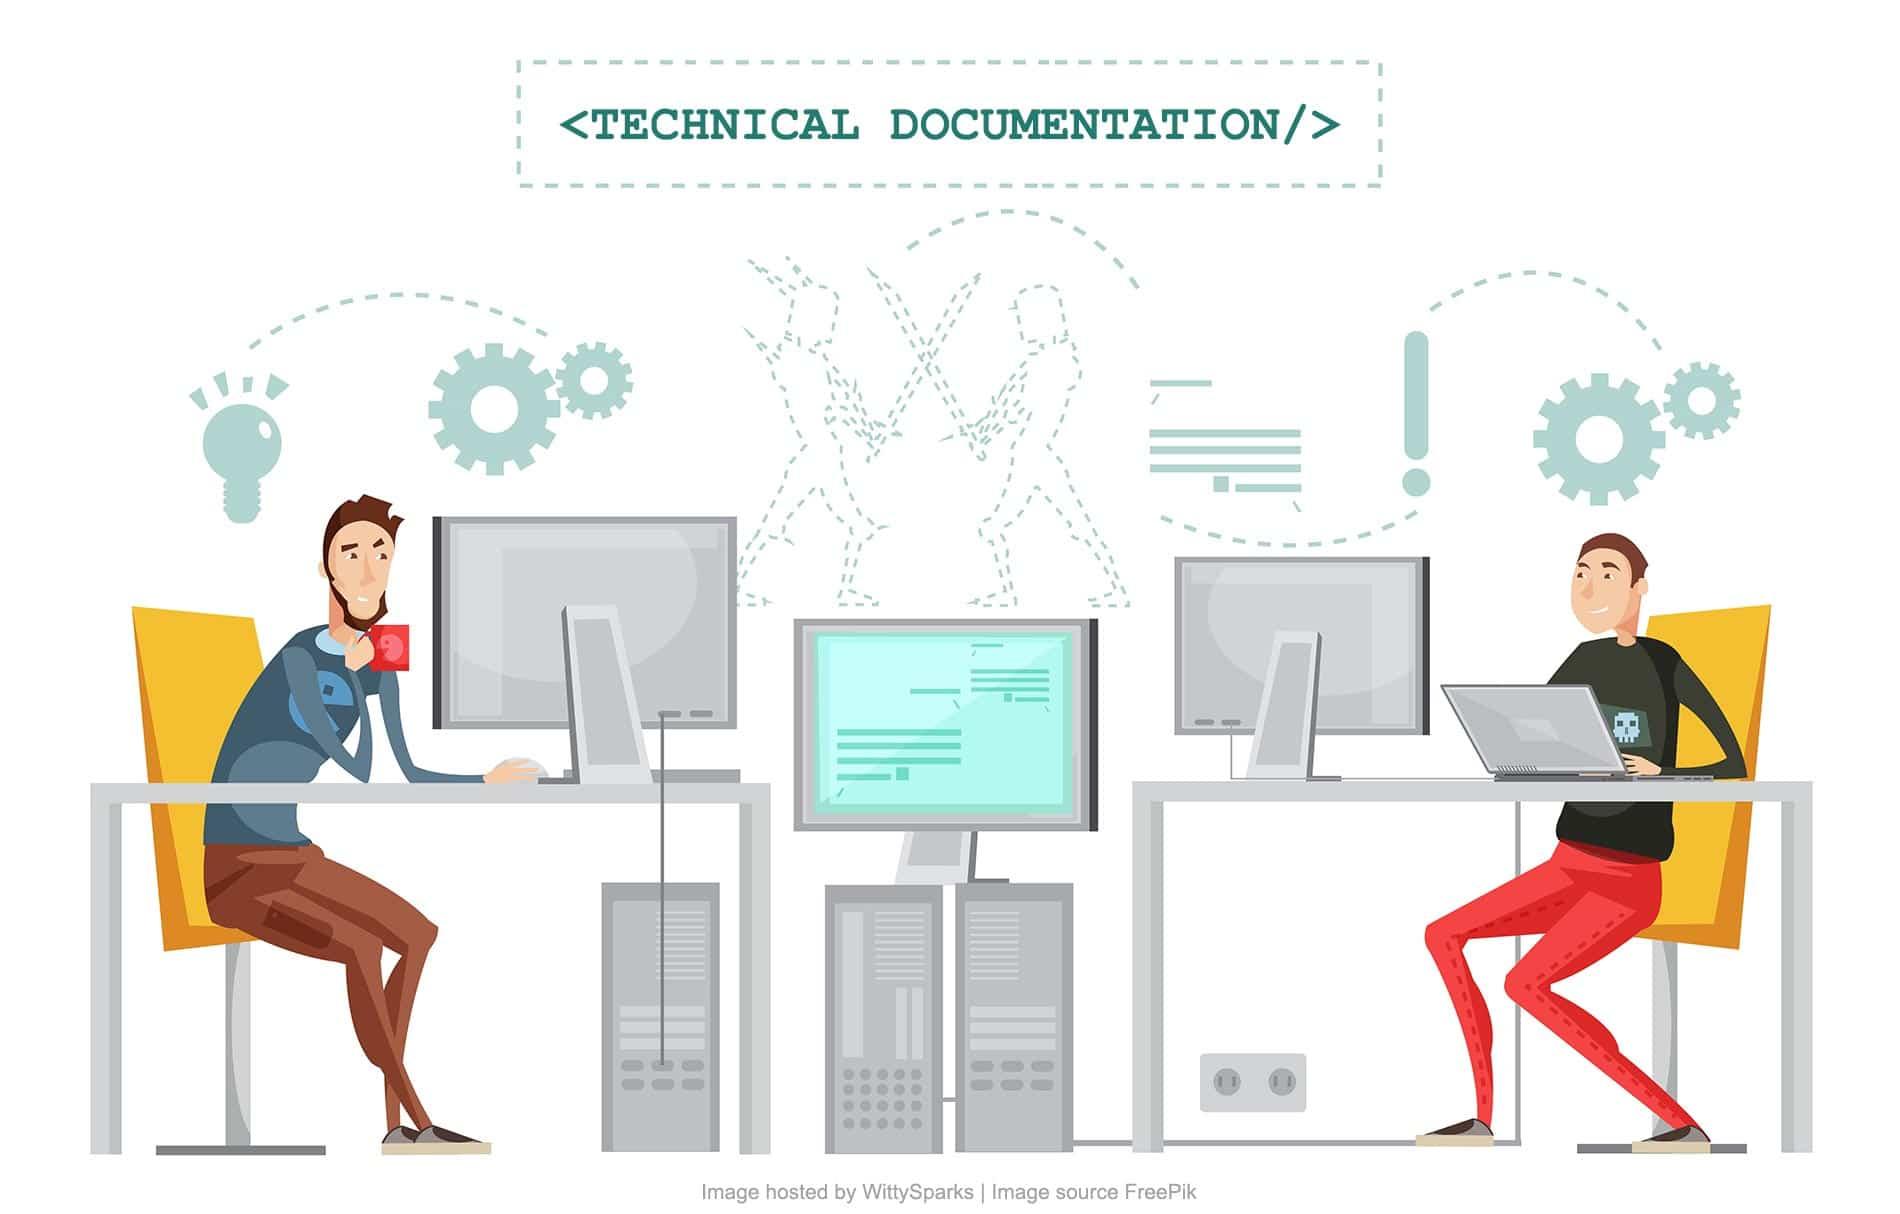 Technical documentation tools